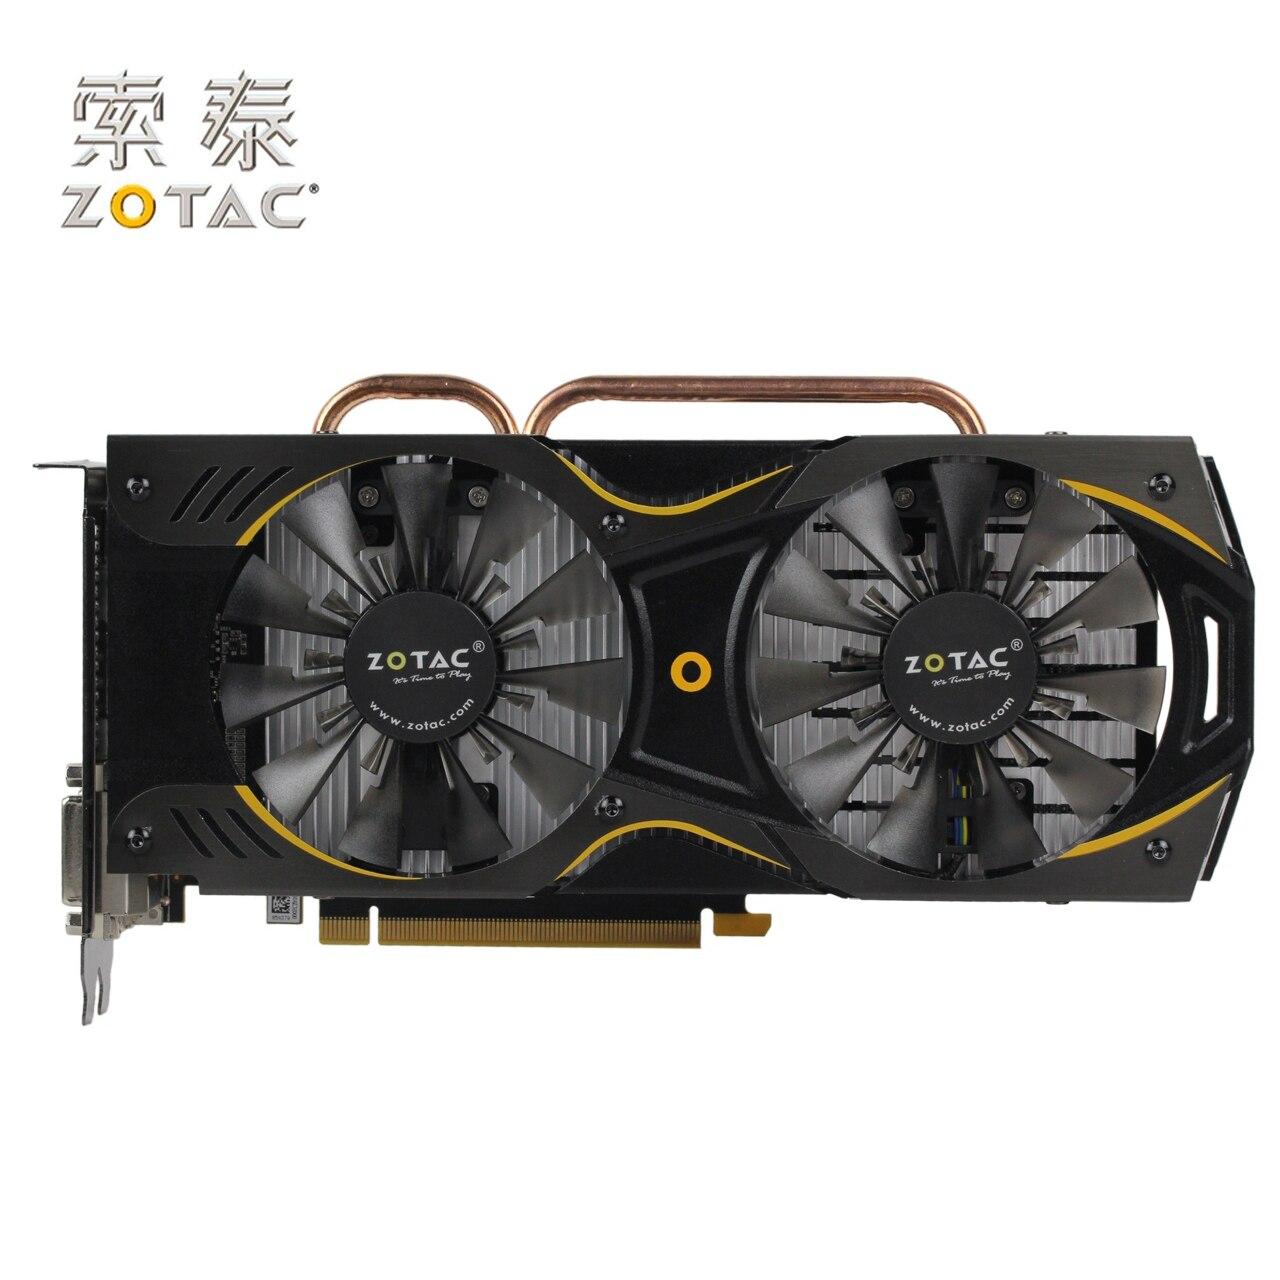 ZOTAC-tarjeta de vídeo Original, GeForce GTX950-2GD5 Thunderbolt HA, 128Bit, GDDR5, para nVIDIA GTX 900, 950, 2G, 6610MHz, 2 GB